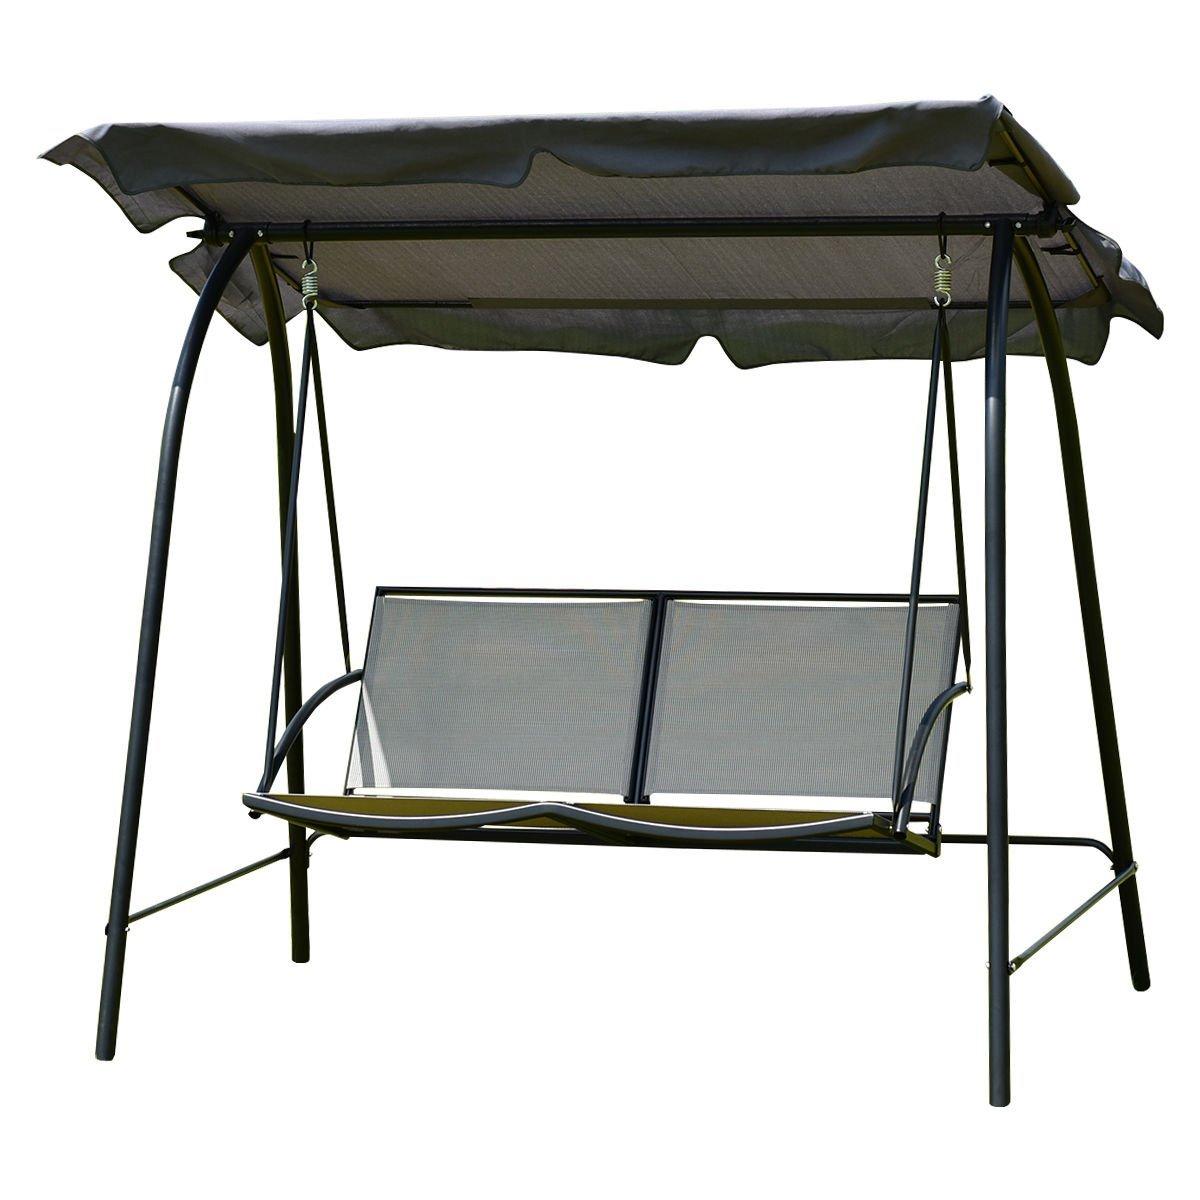 AK Energy Loveseat Patio Canopy 2 Seat Swing Glider Hammock Cushioned Steel Outdoor Gray